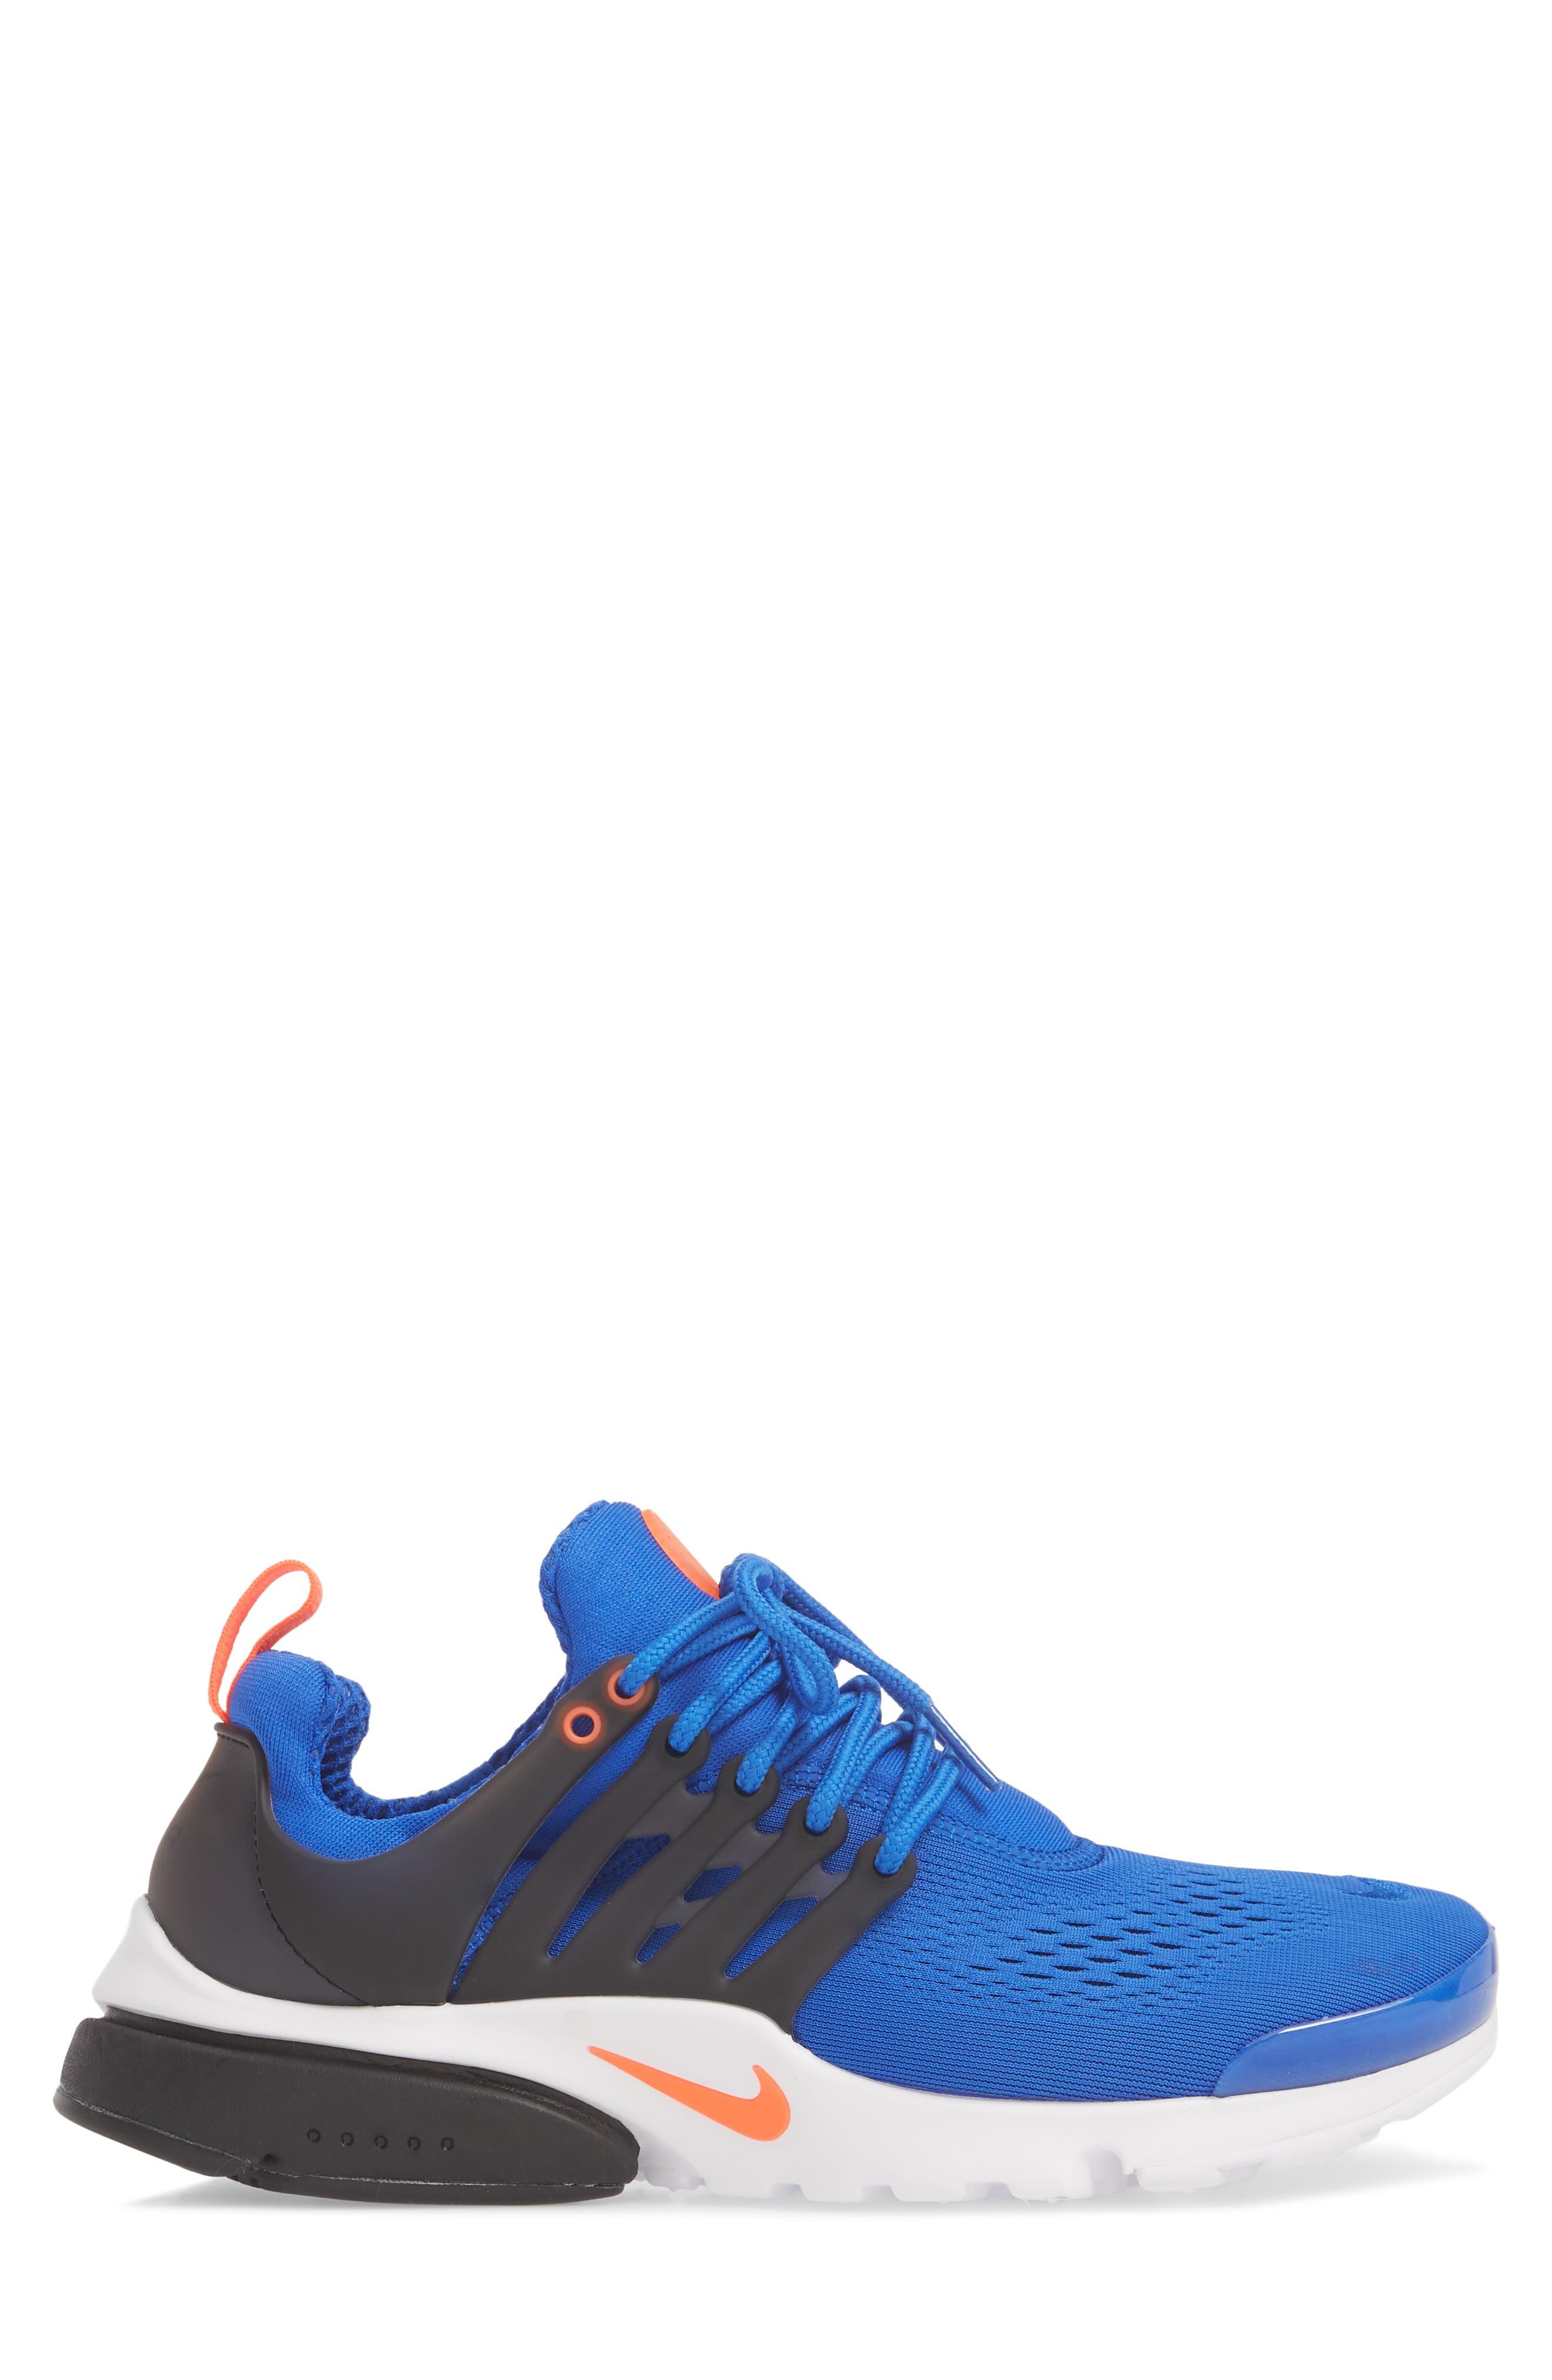 Air Presto Ultra Breathe Sneaker,                             Alternate thumbnail 3, color,                             Racer Blue/ Total Crimson